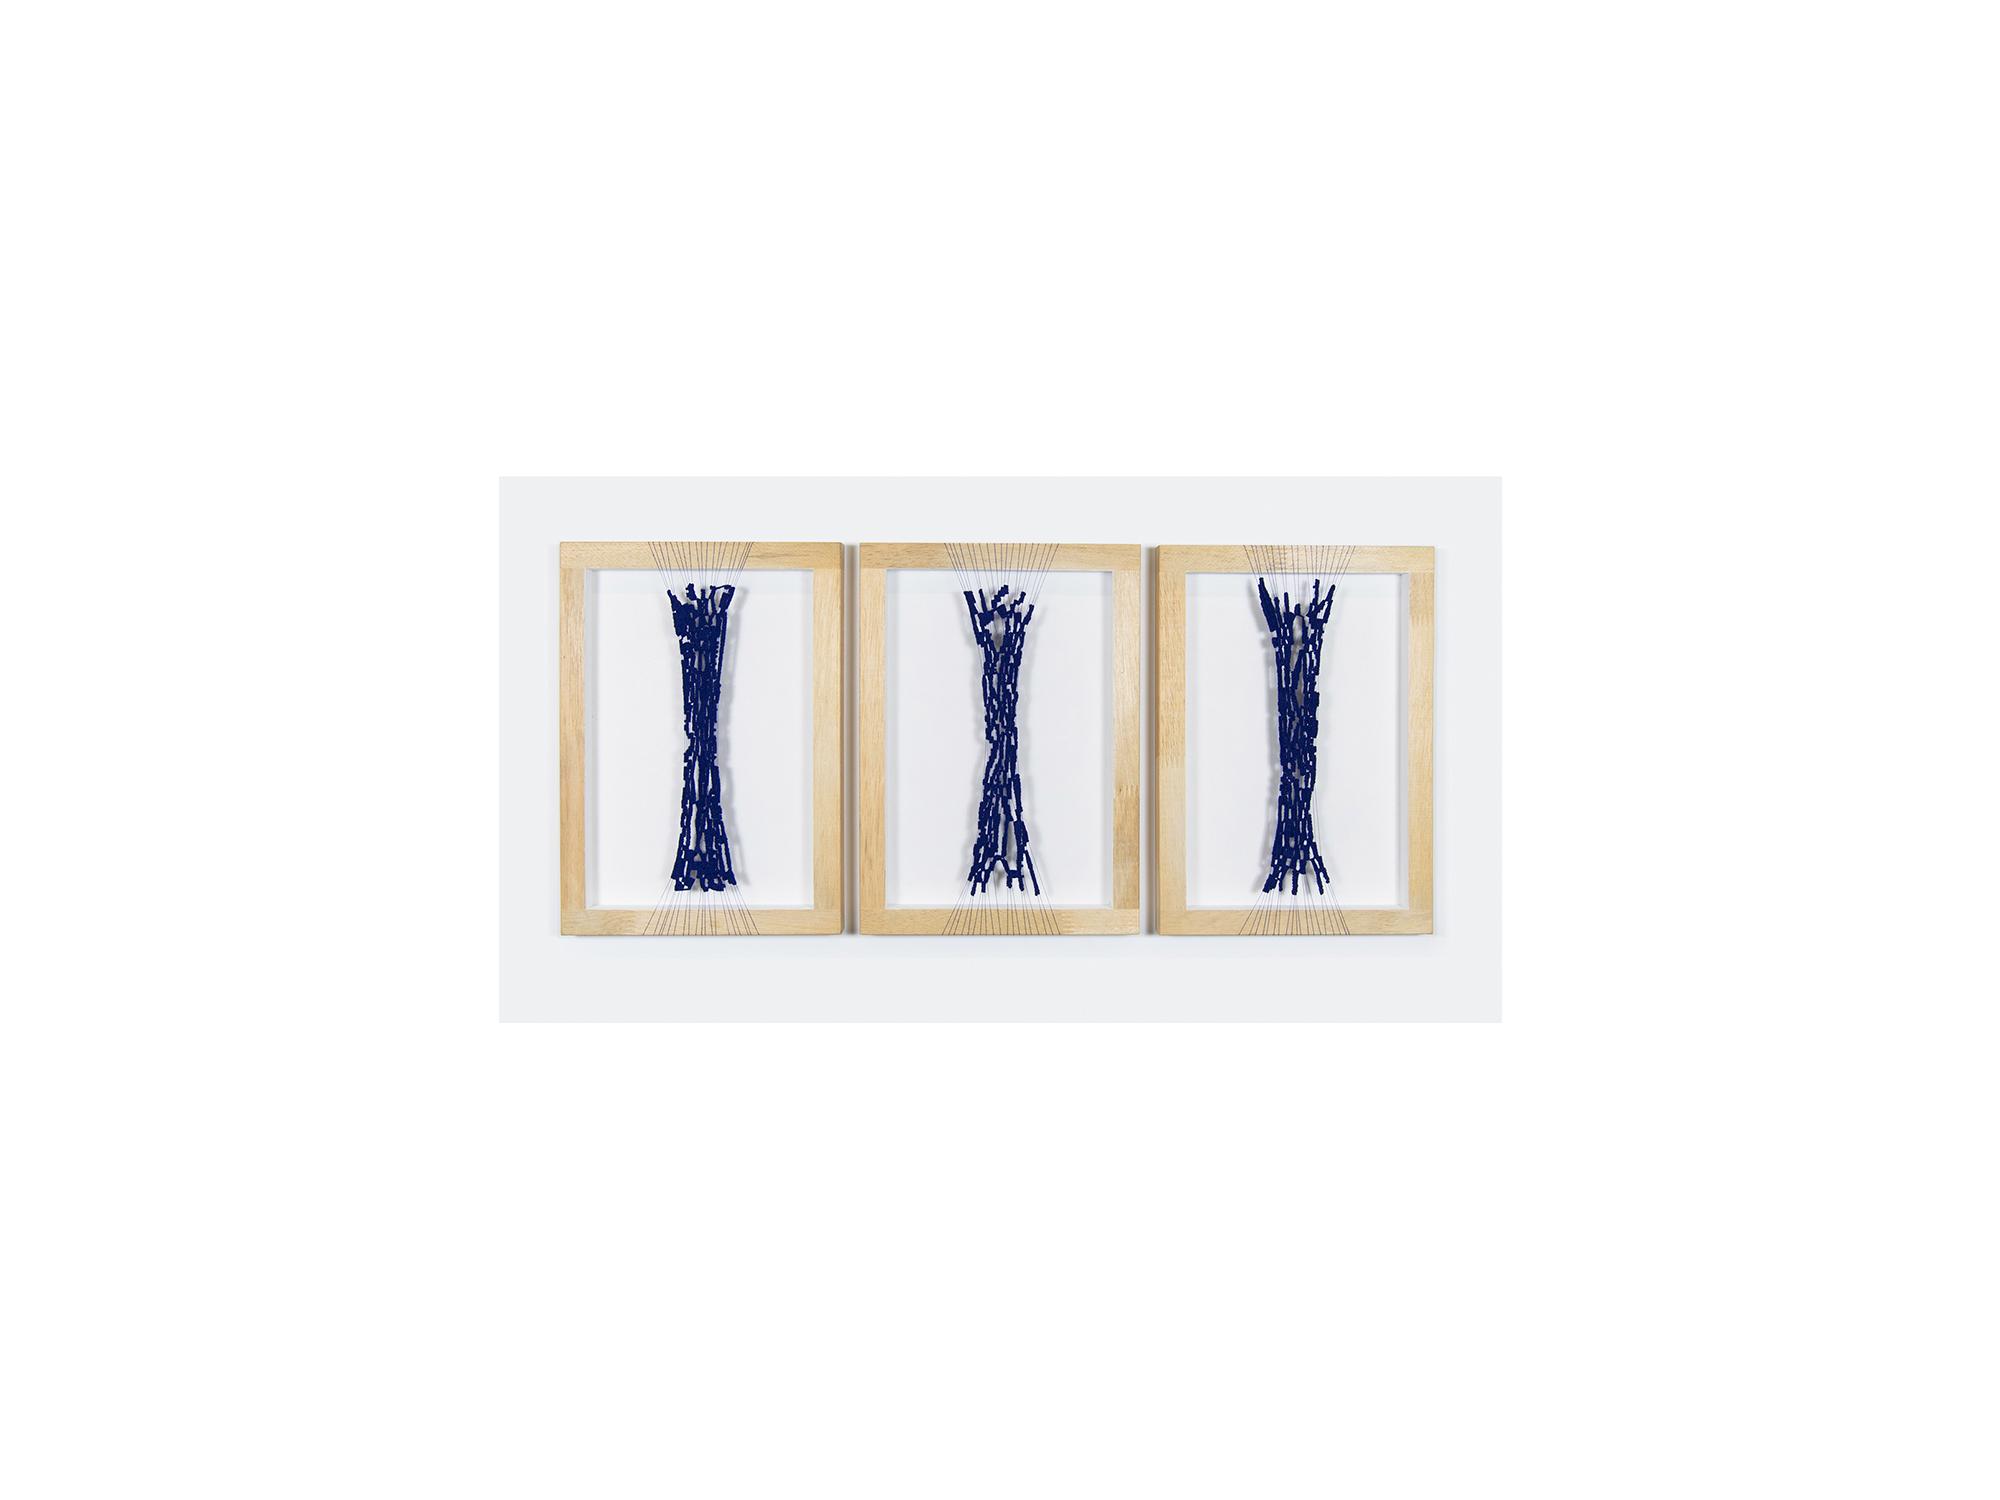 Dana Harris   unfinished seams l, II & III , 2017 cotton, acrylic, wooden frame each: 29.7 x 21cm